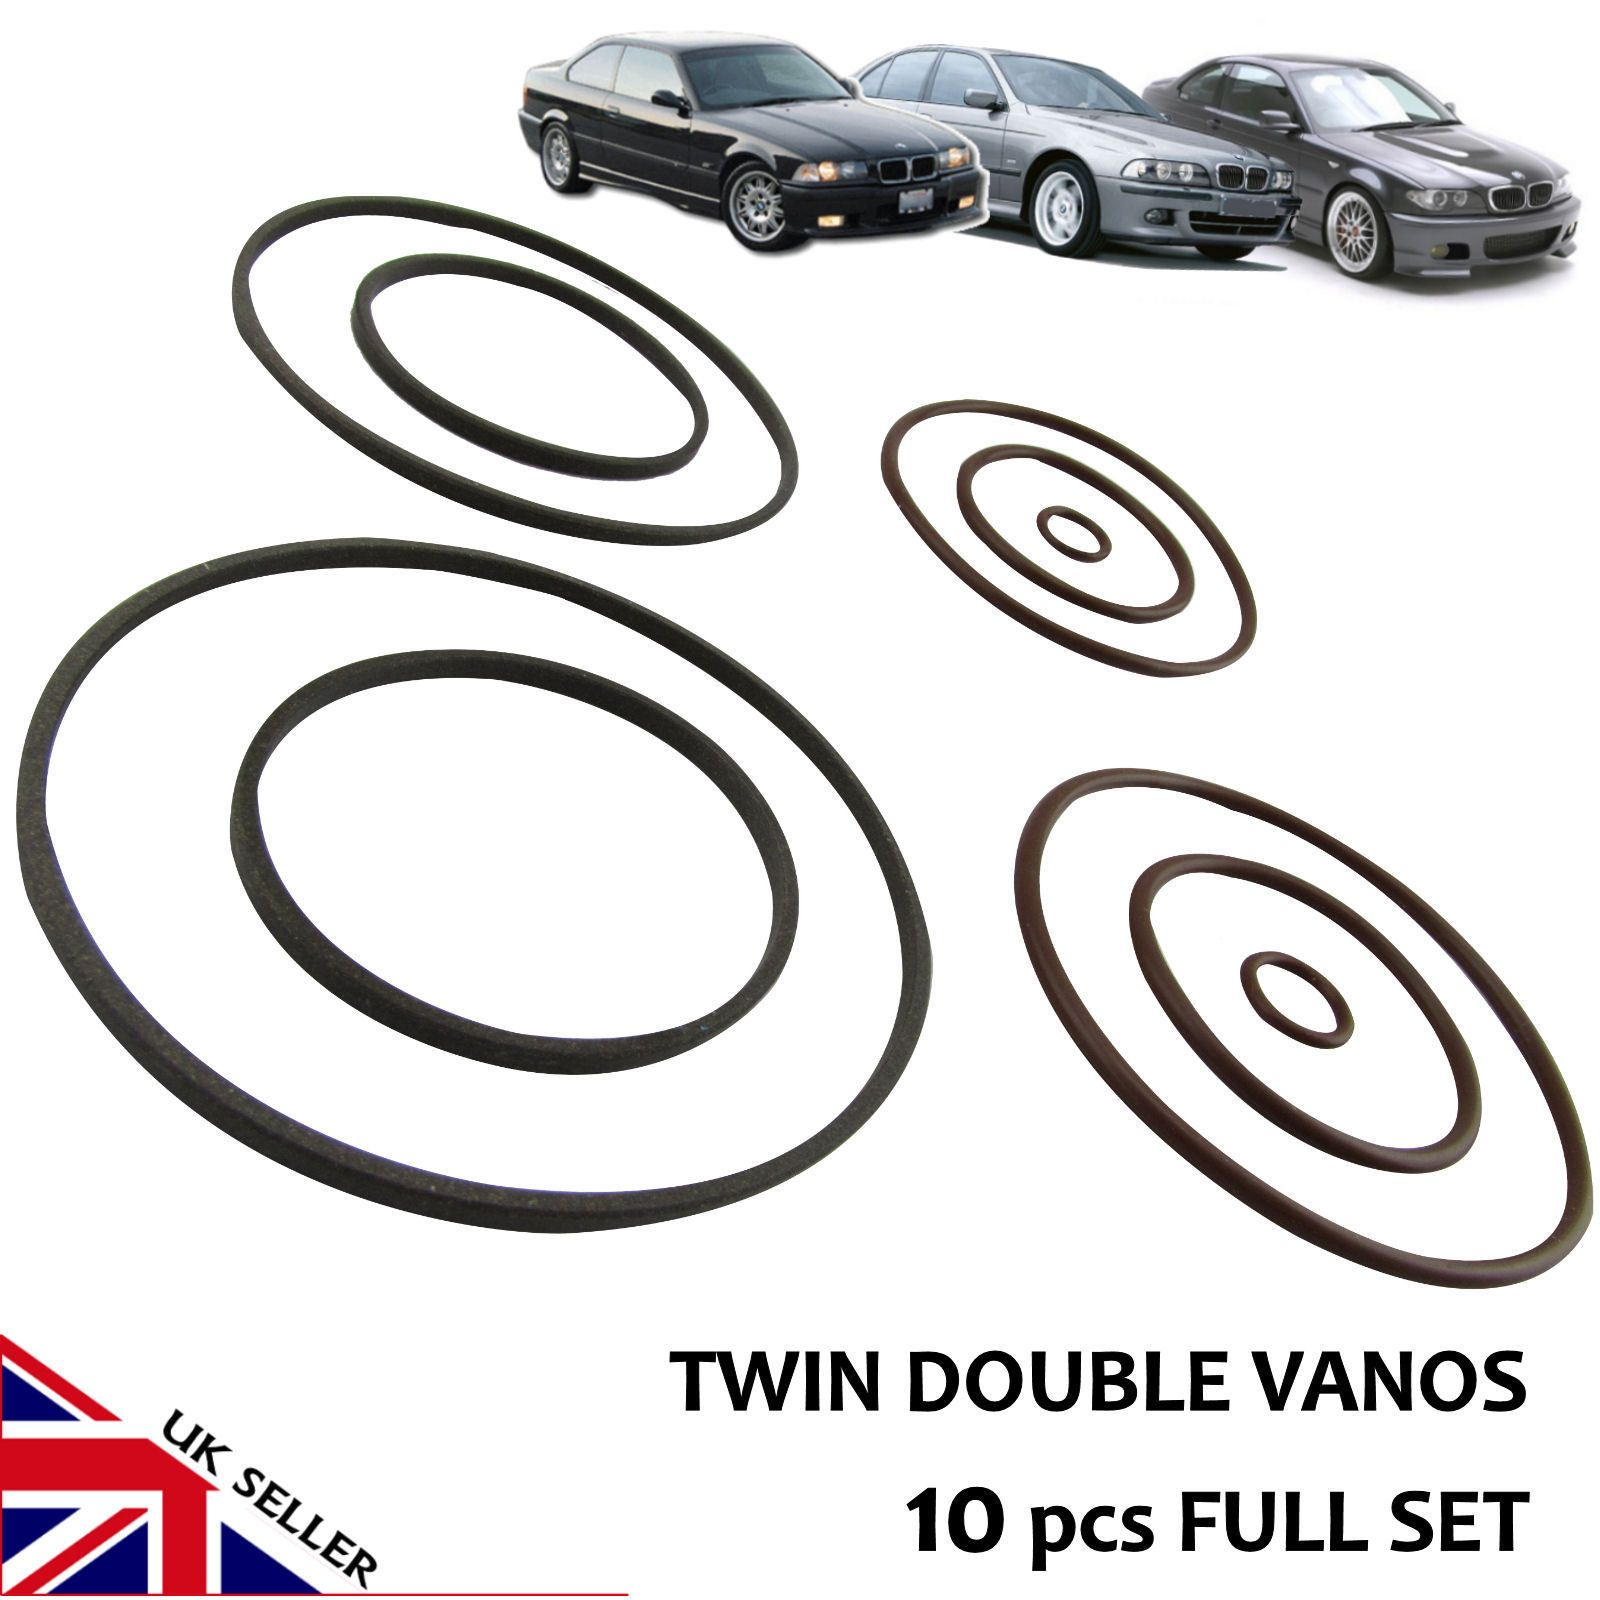 BMW VANOS SEALS Twin Double Dual VANOS Repair upgrade Set For M52TU M54 M56 New